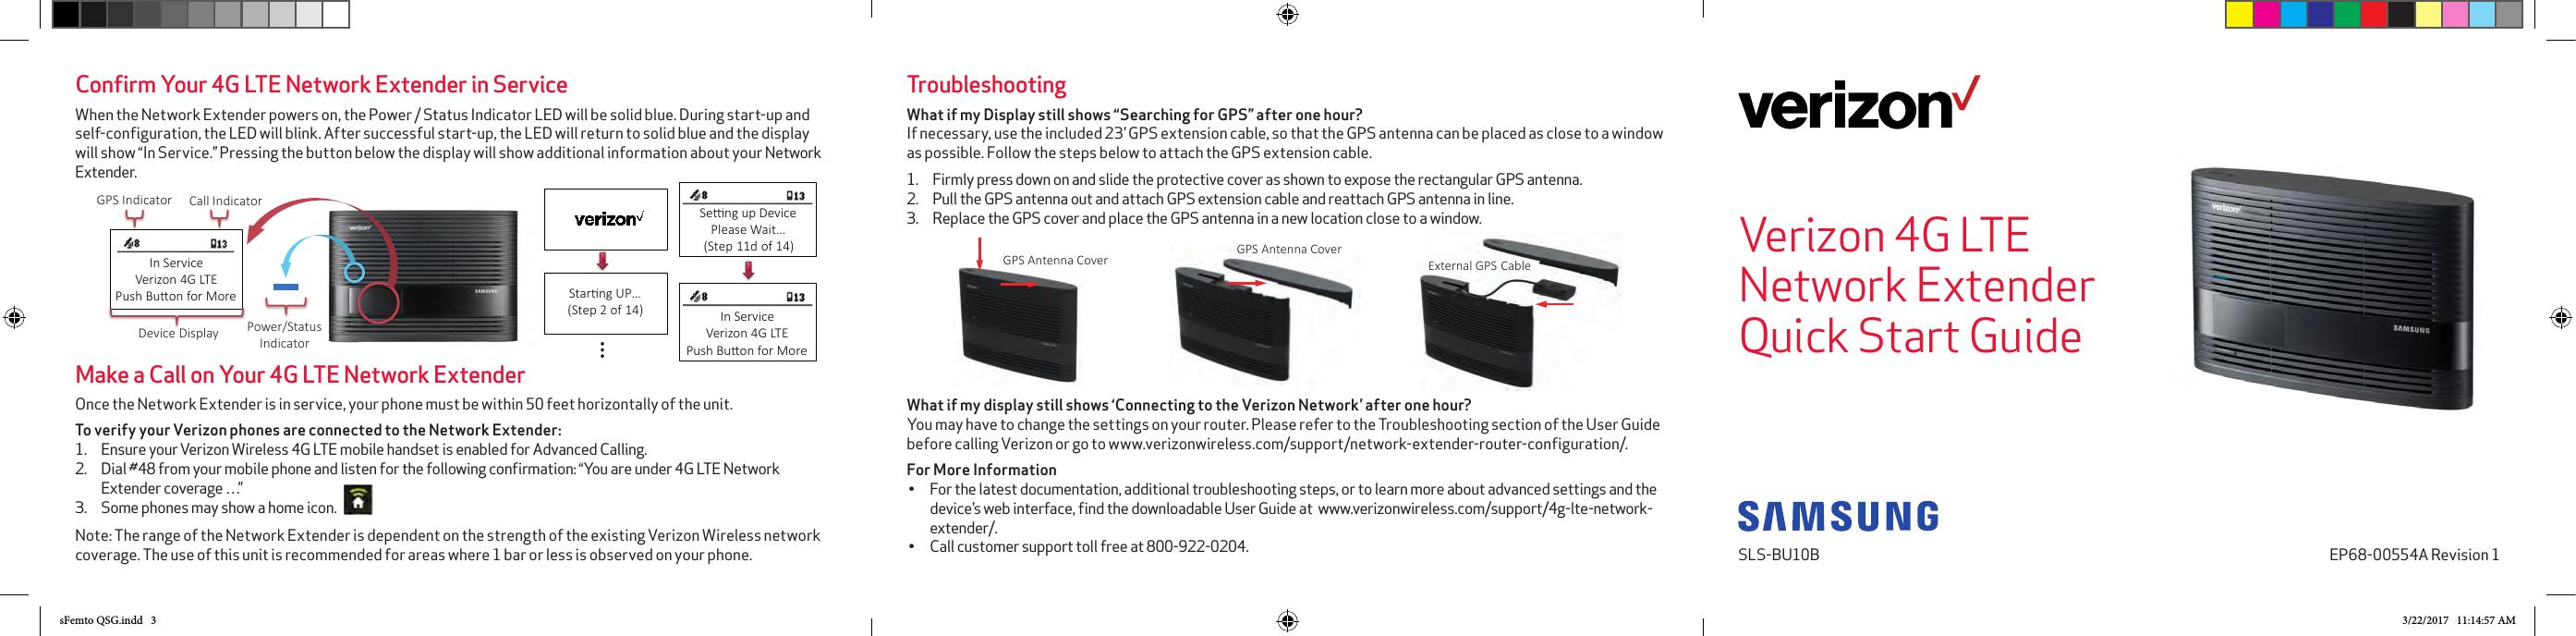 Samsung Electronics Co Sls Bu10b Sfemto 2 User Manual